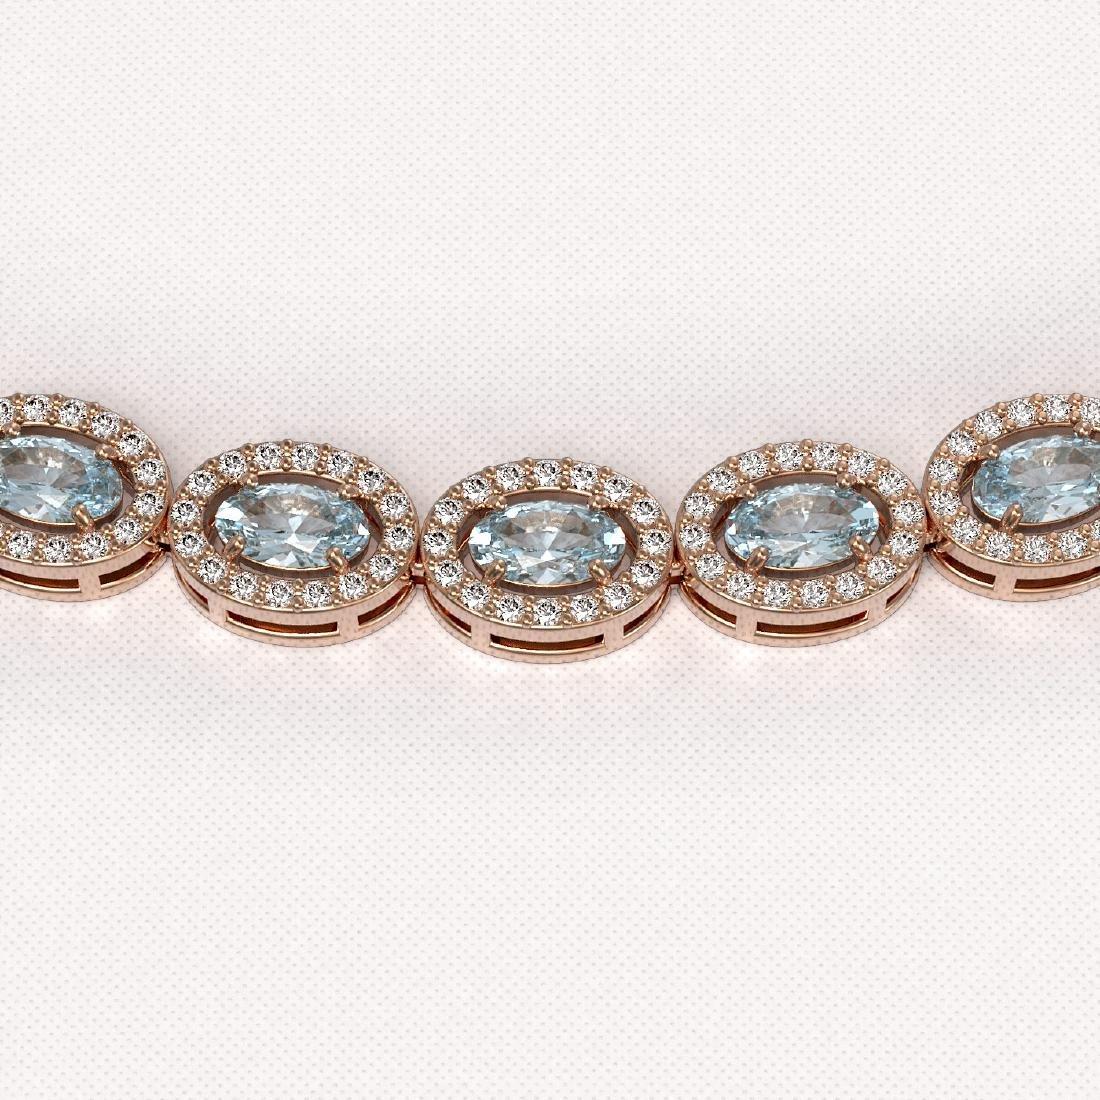 20.71 CTW Aquamarine & Diamond Halo Necklace 10K Rose - 3